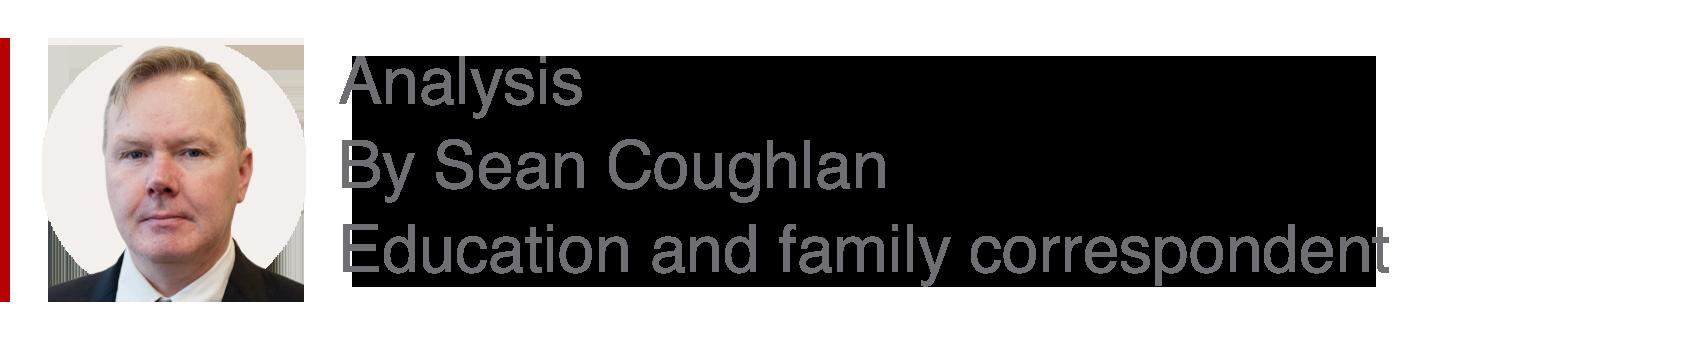 Analysis box by Sean Coughlan, education correspondent